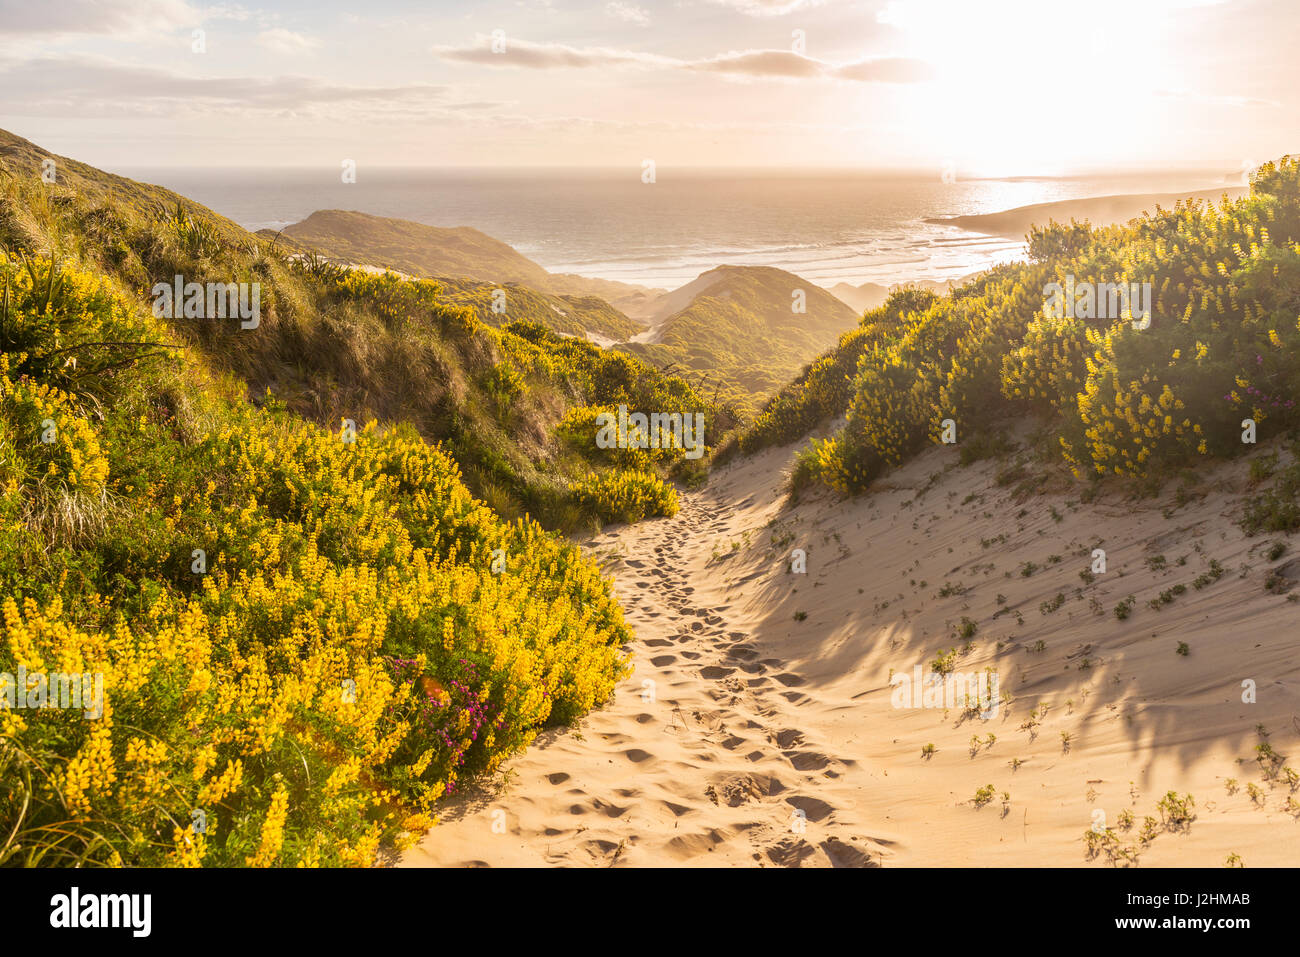 Yellow Lupines (Lupinus luteus) on sand dunes, view of coast, Sandfly Bay, Dunedin, Otago Region, Otago Peninsula, - Stock Image